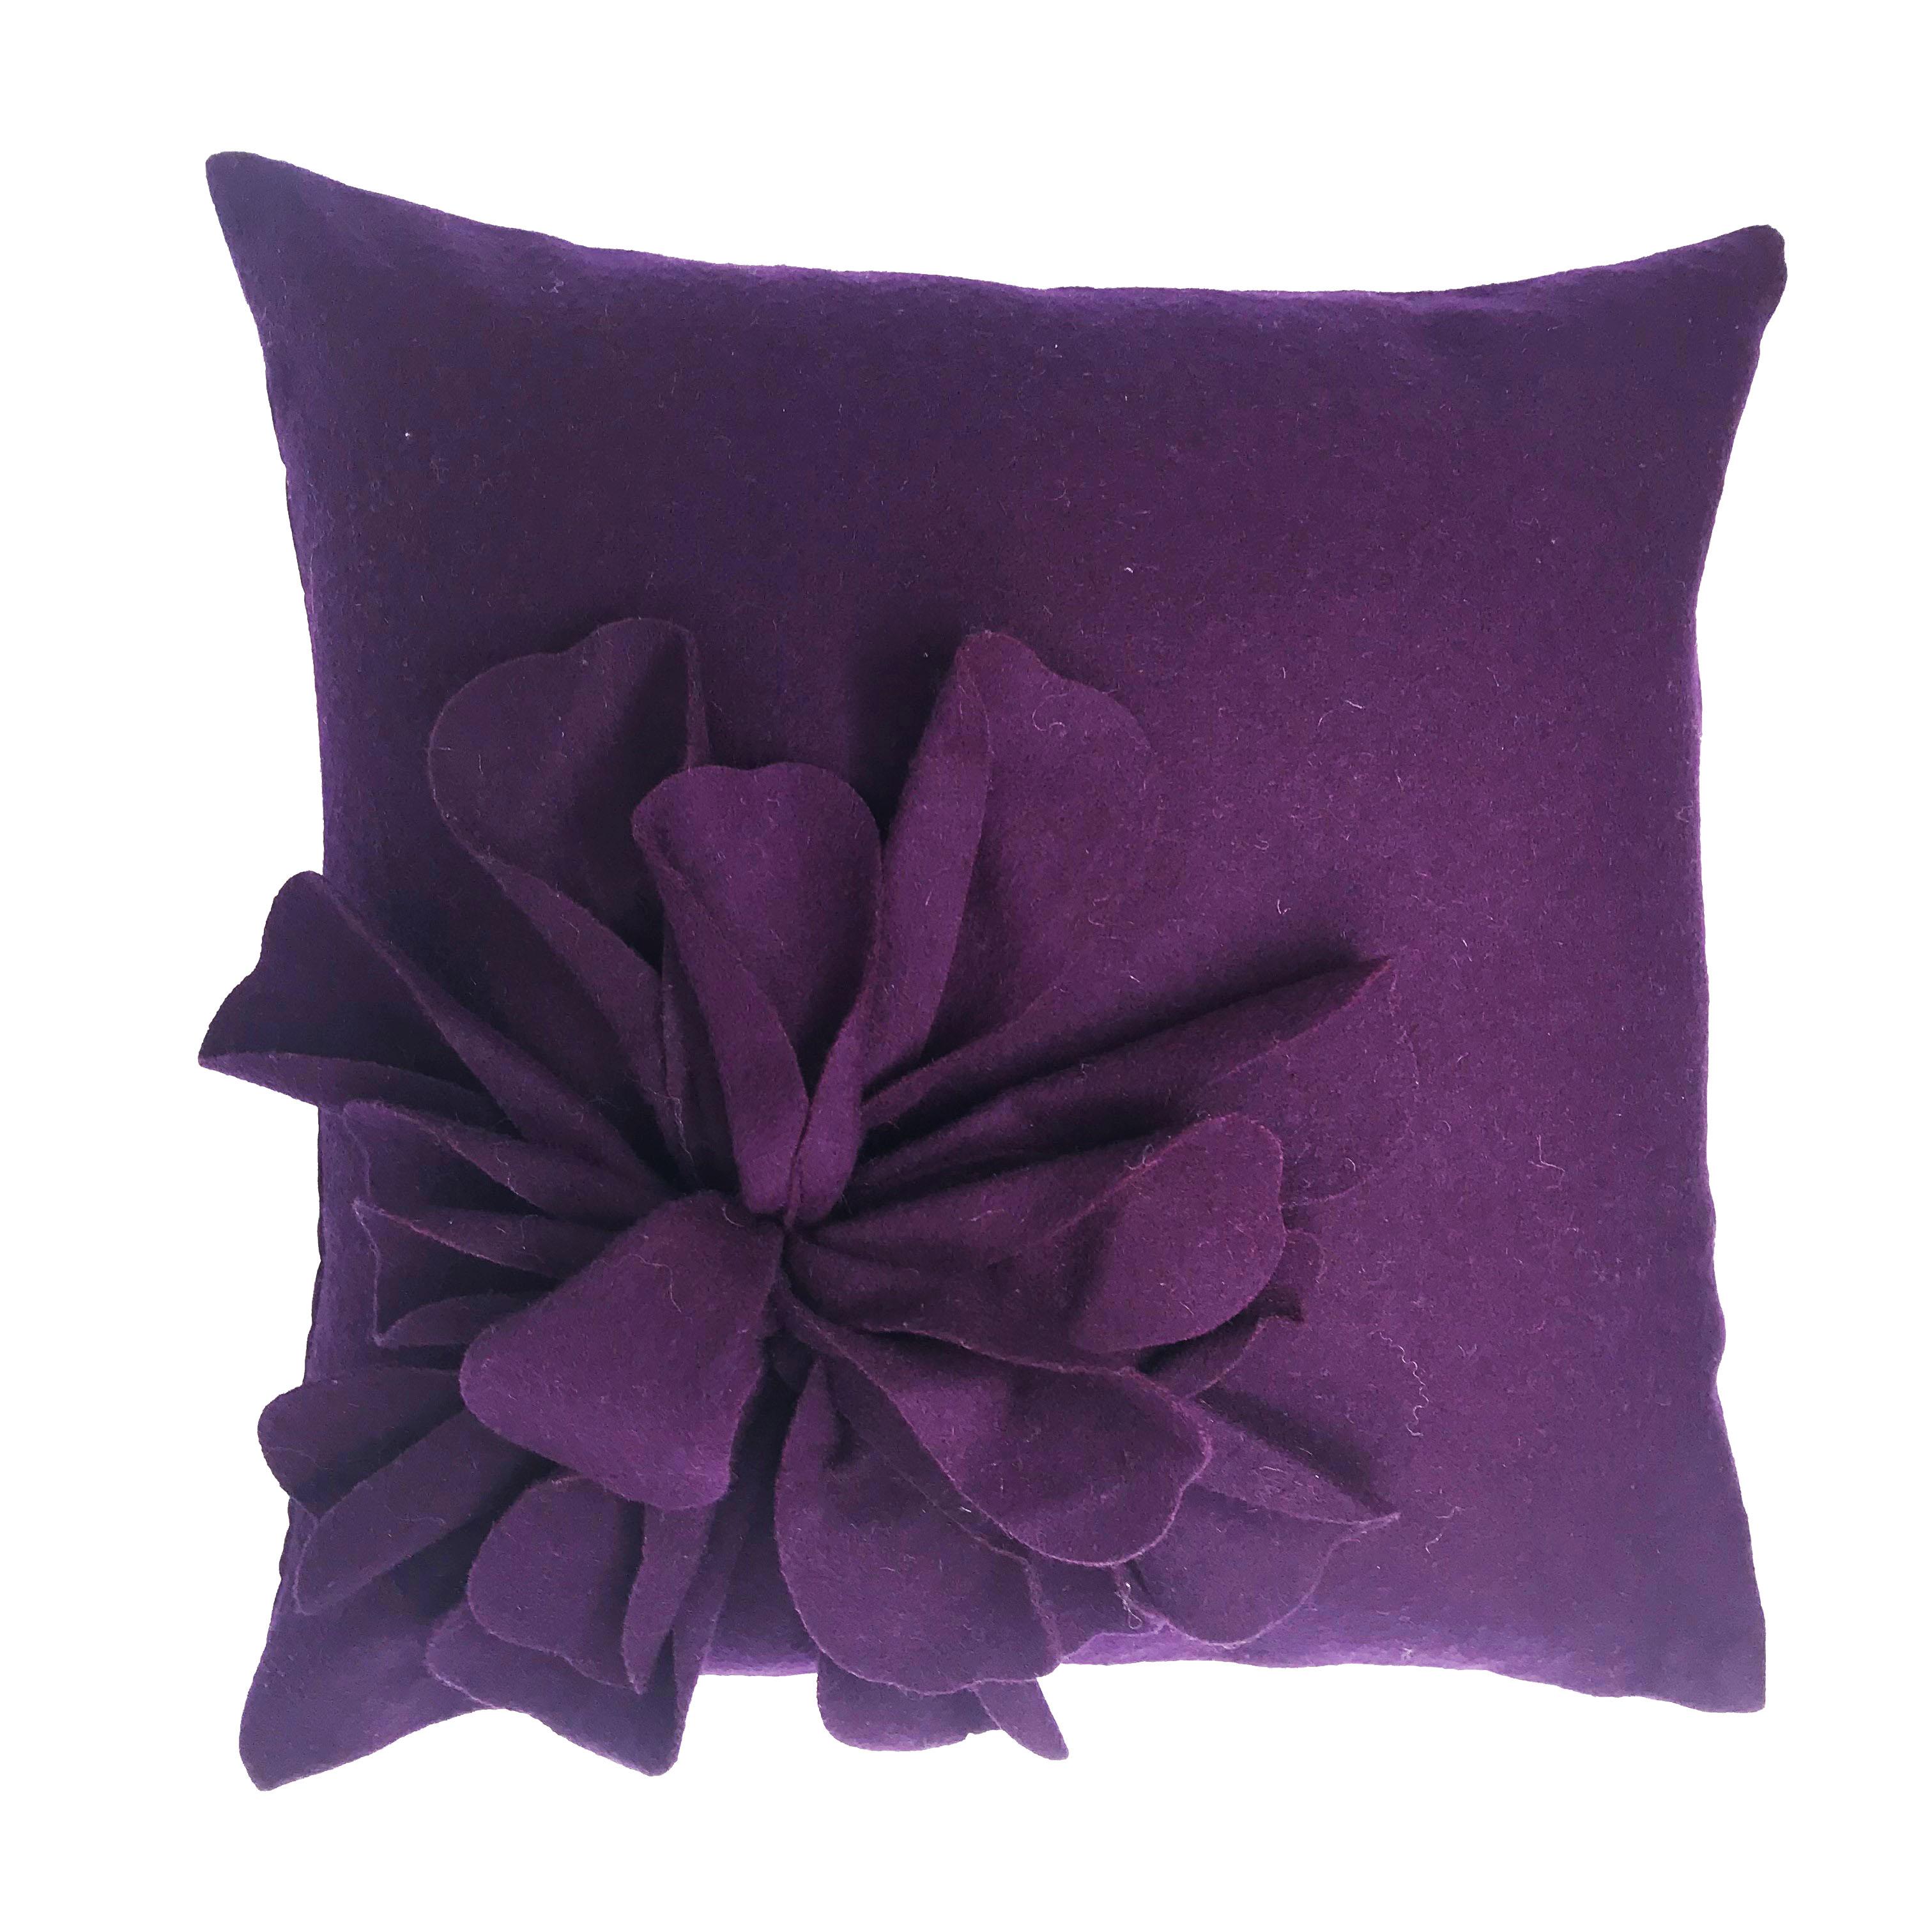 Bohemia Purple Aubergine Wool Rich 3D Flower 45cm x 45cm Cushion Cover Only